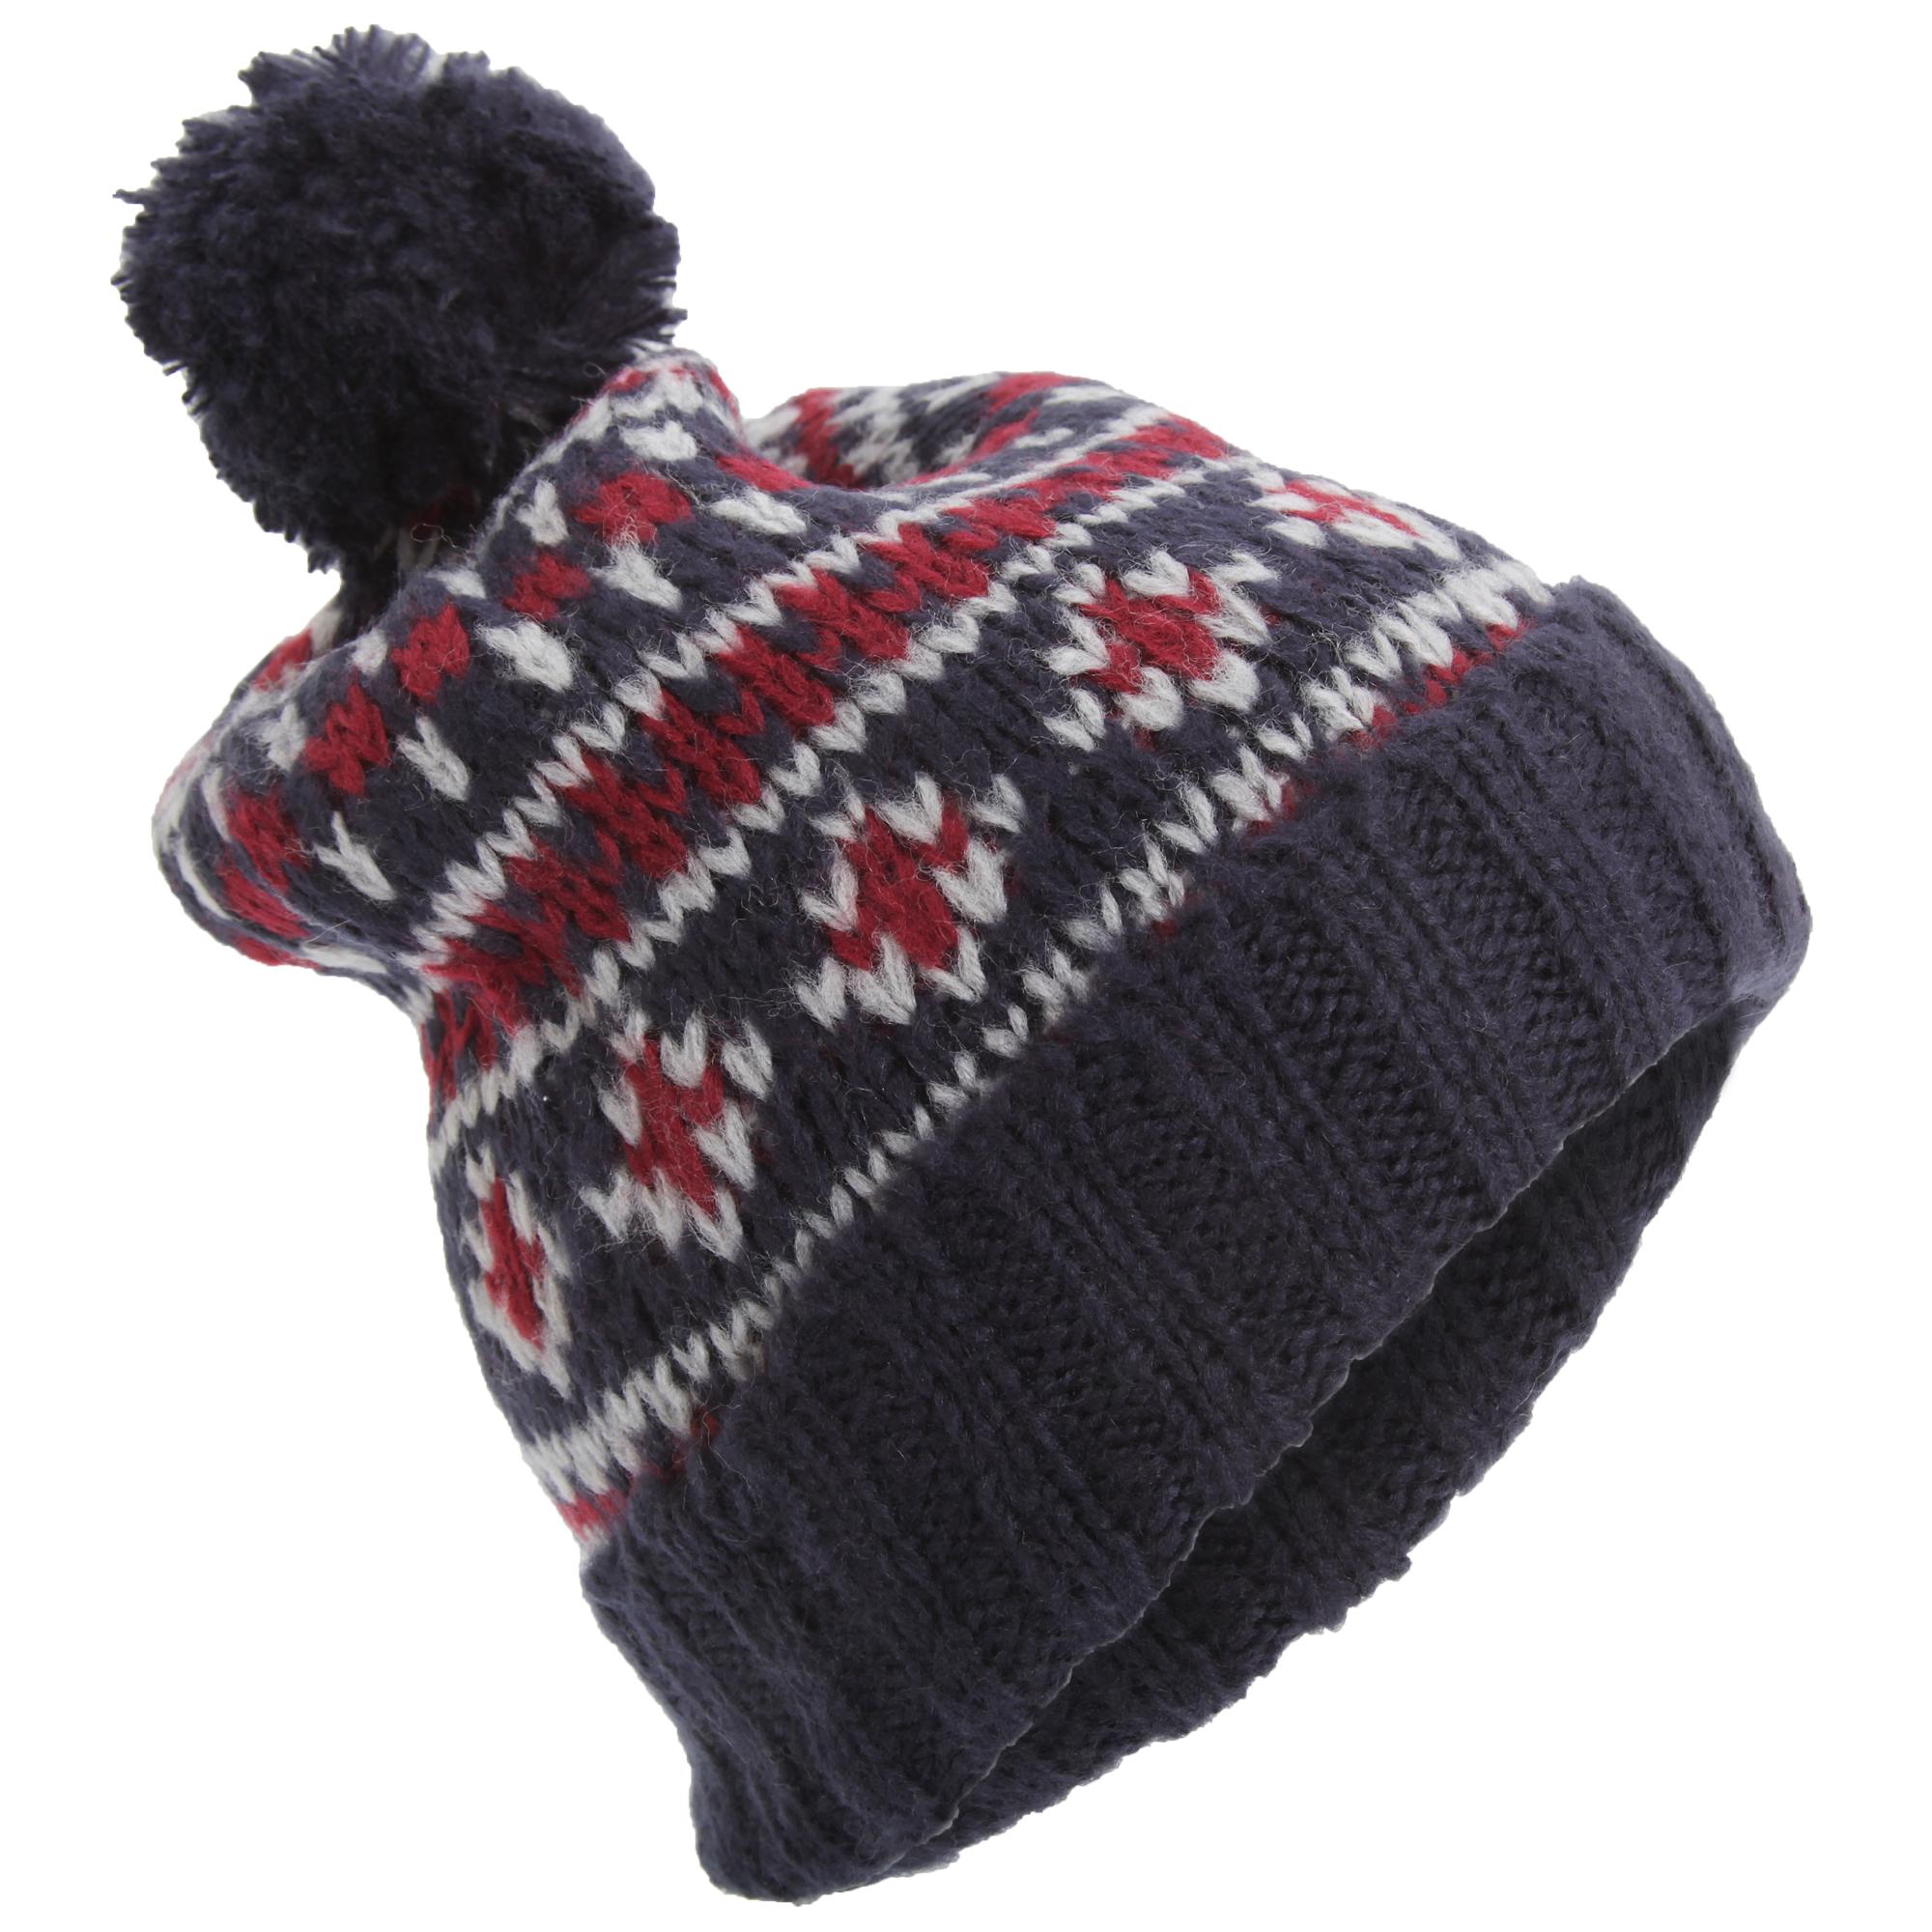 Mens Soft Brushed Fairisle Pattern Warm Winter Bobble Hat ...